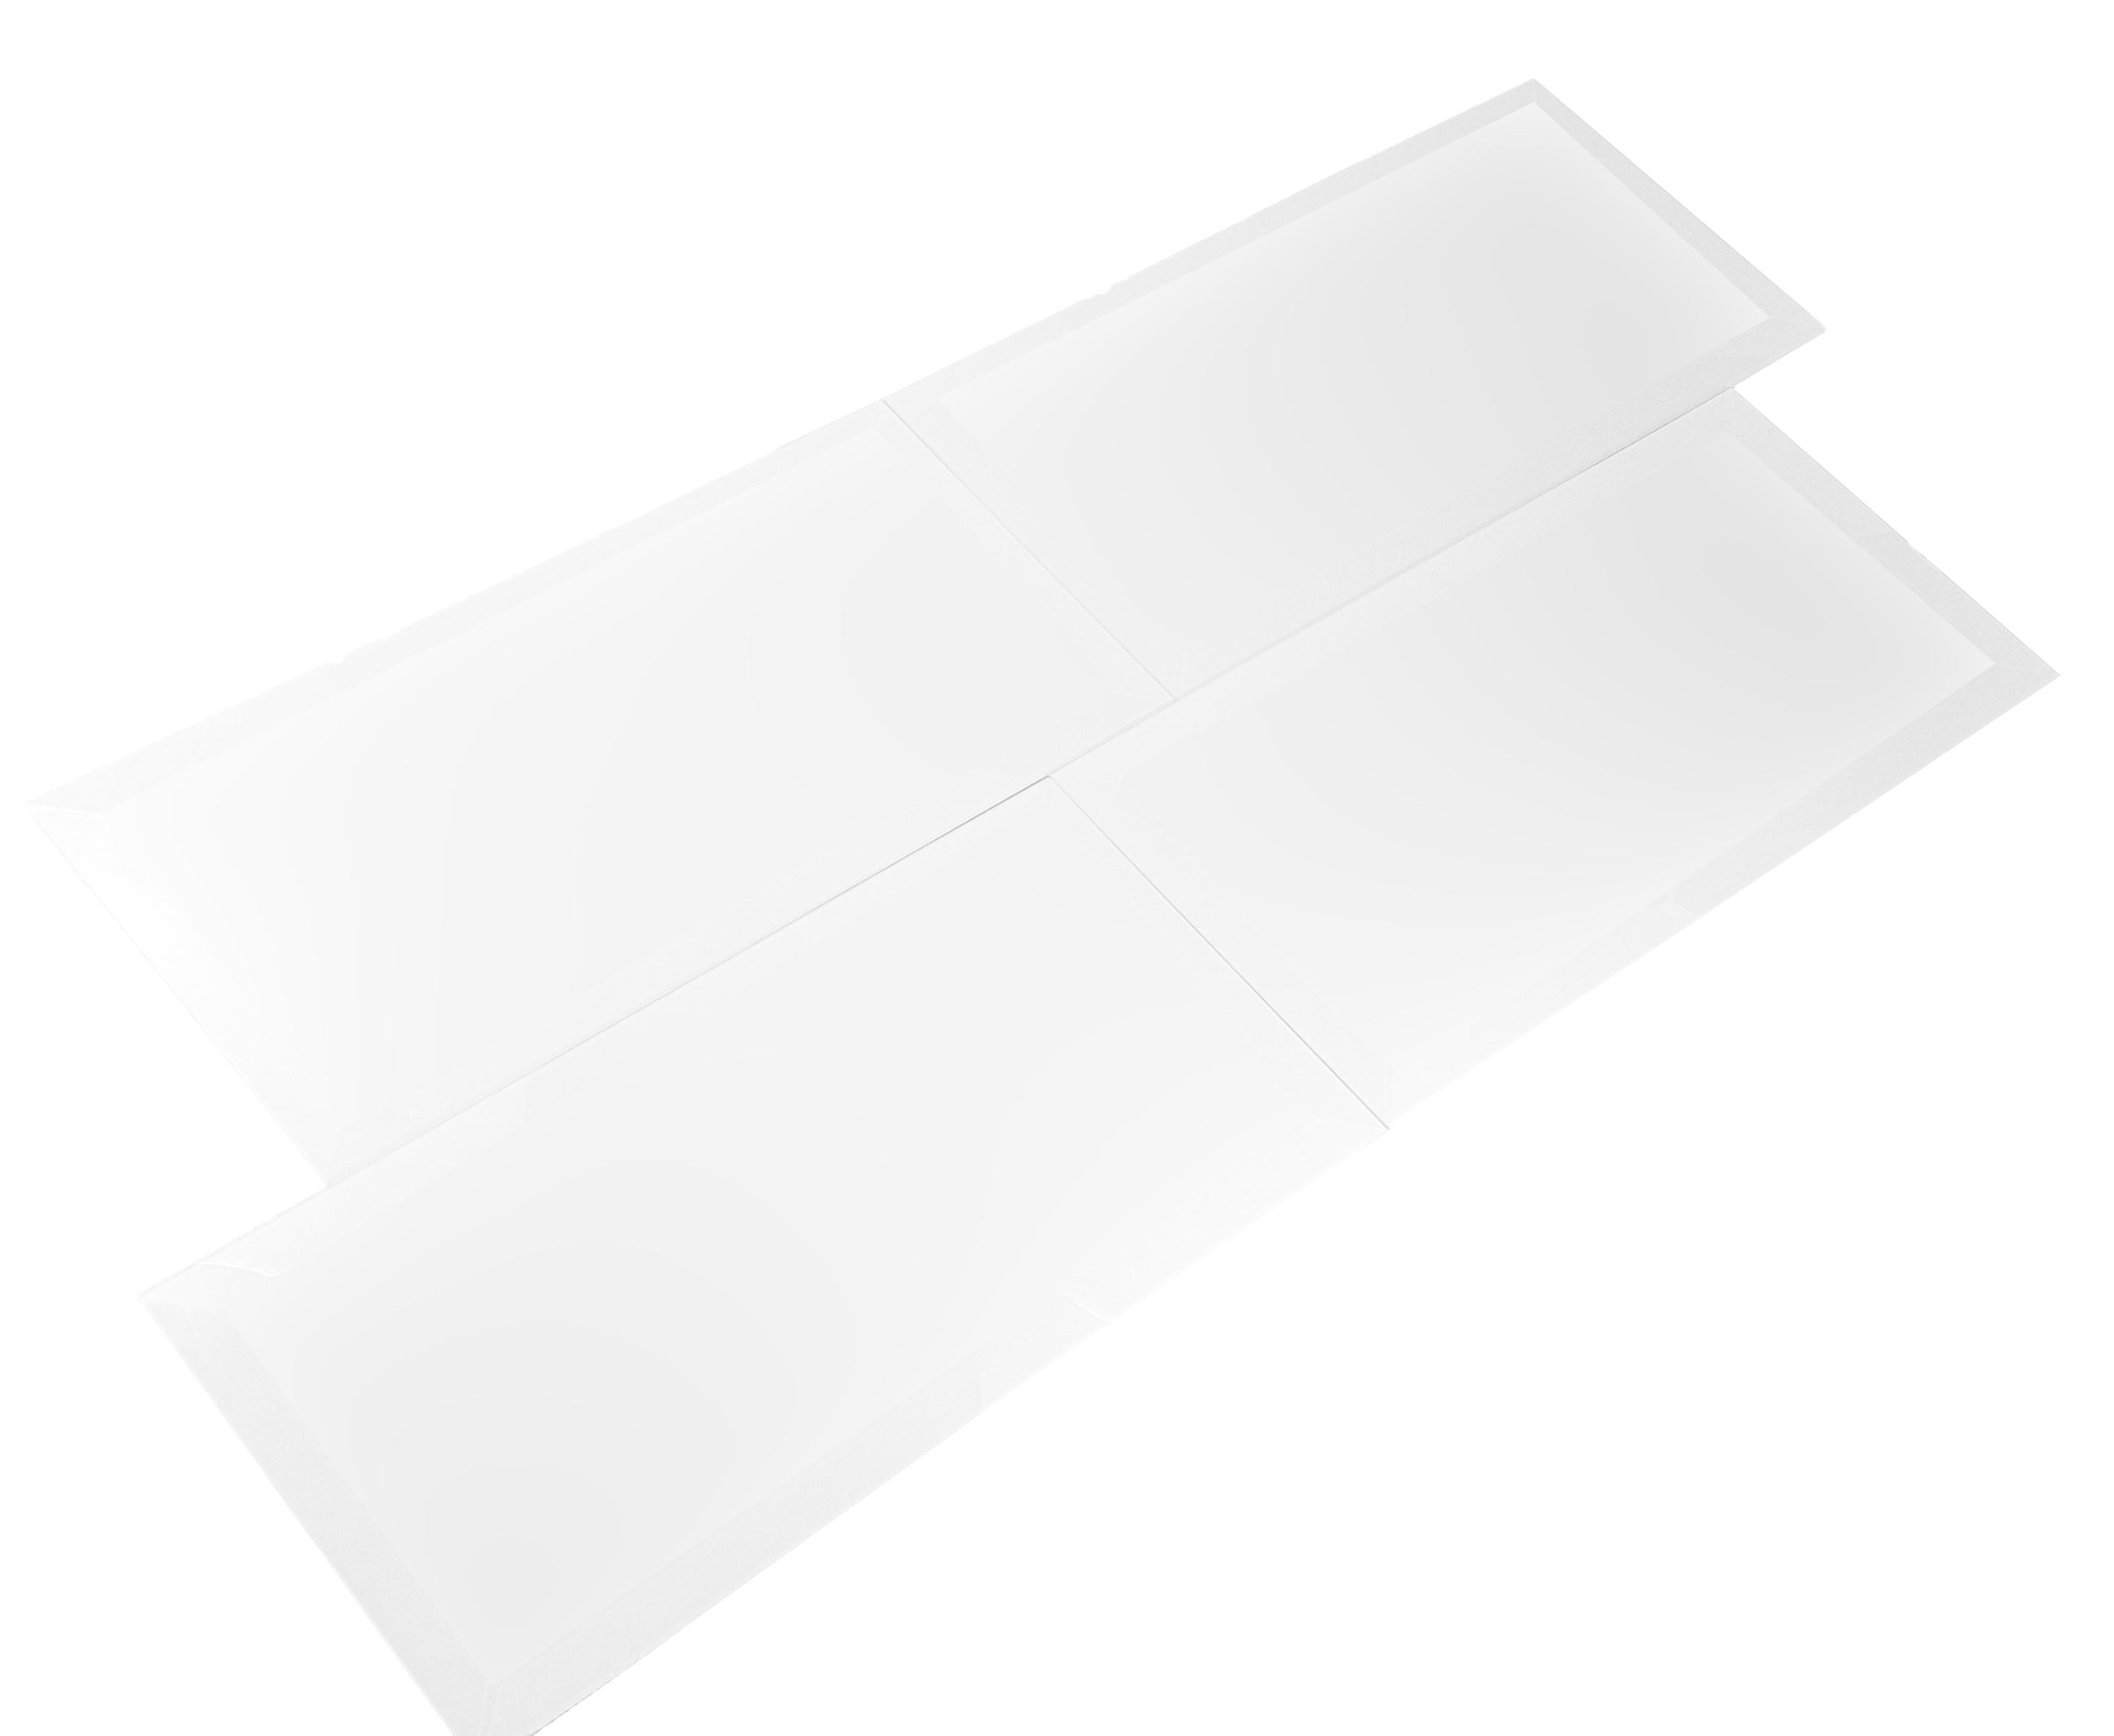 "Frosted Elegance 8"" x 16"" Matte White Glass Field Backsplash Wall Tile"